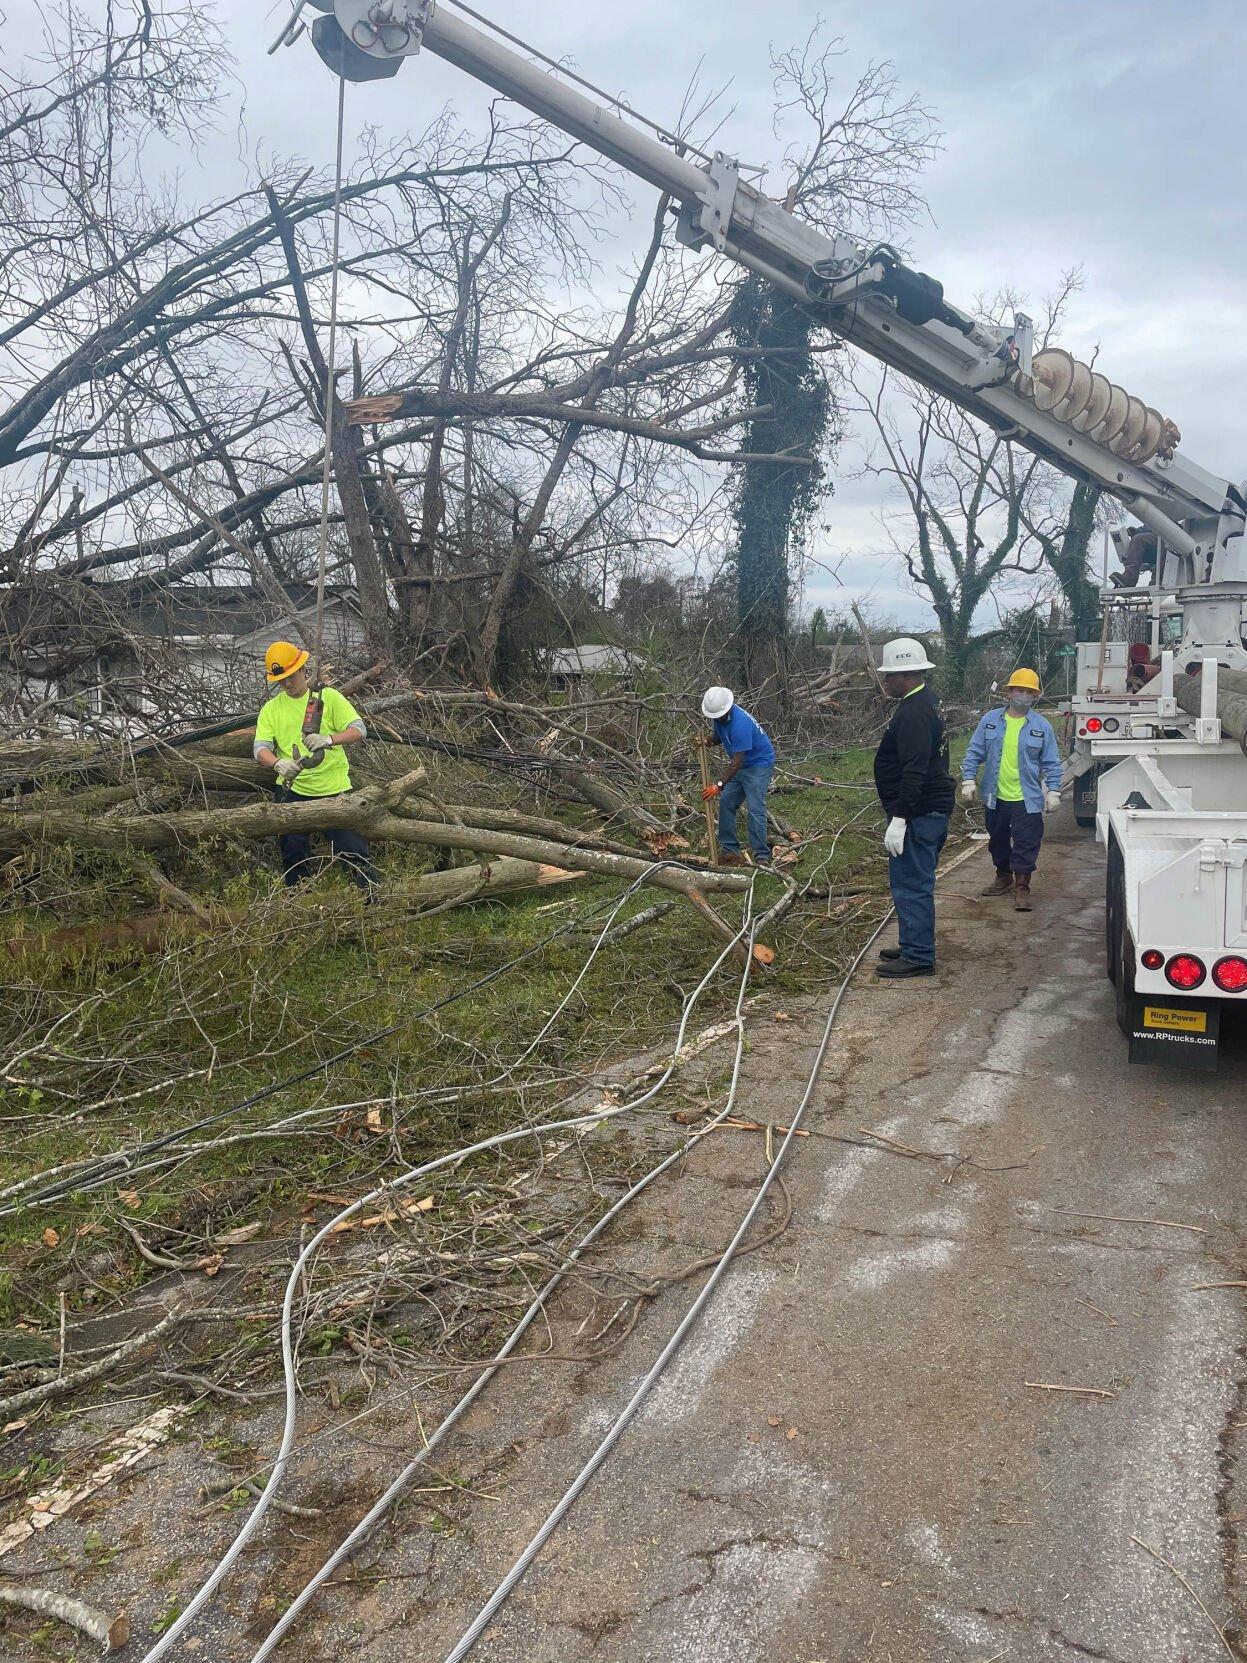 East Point Power crews